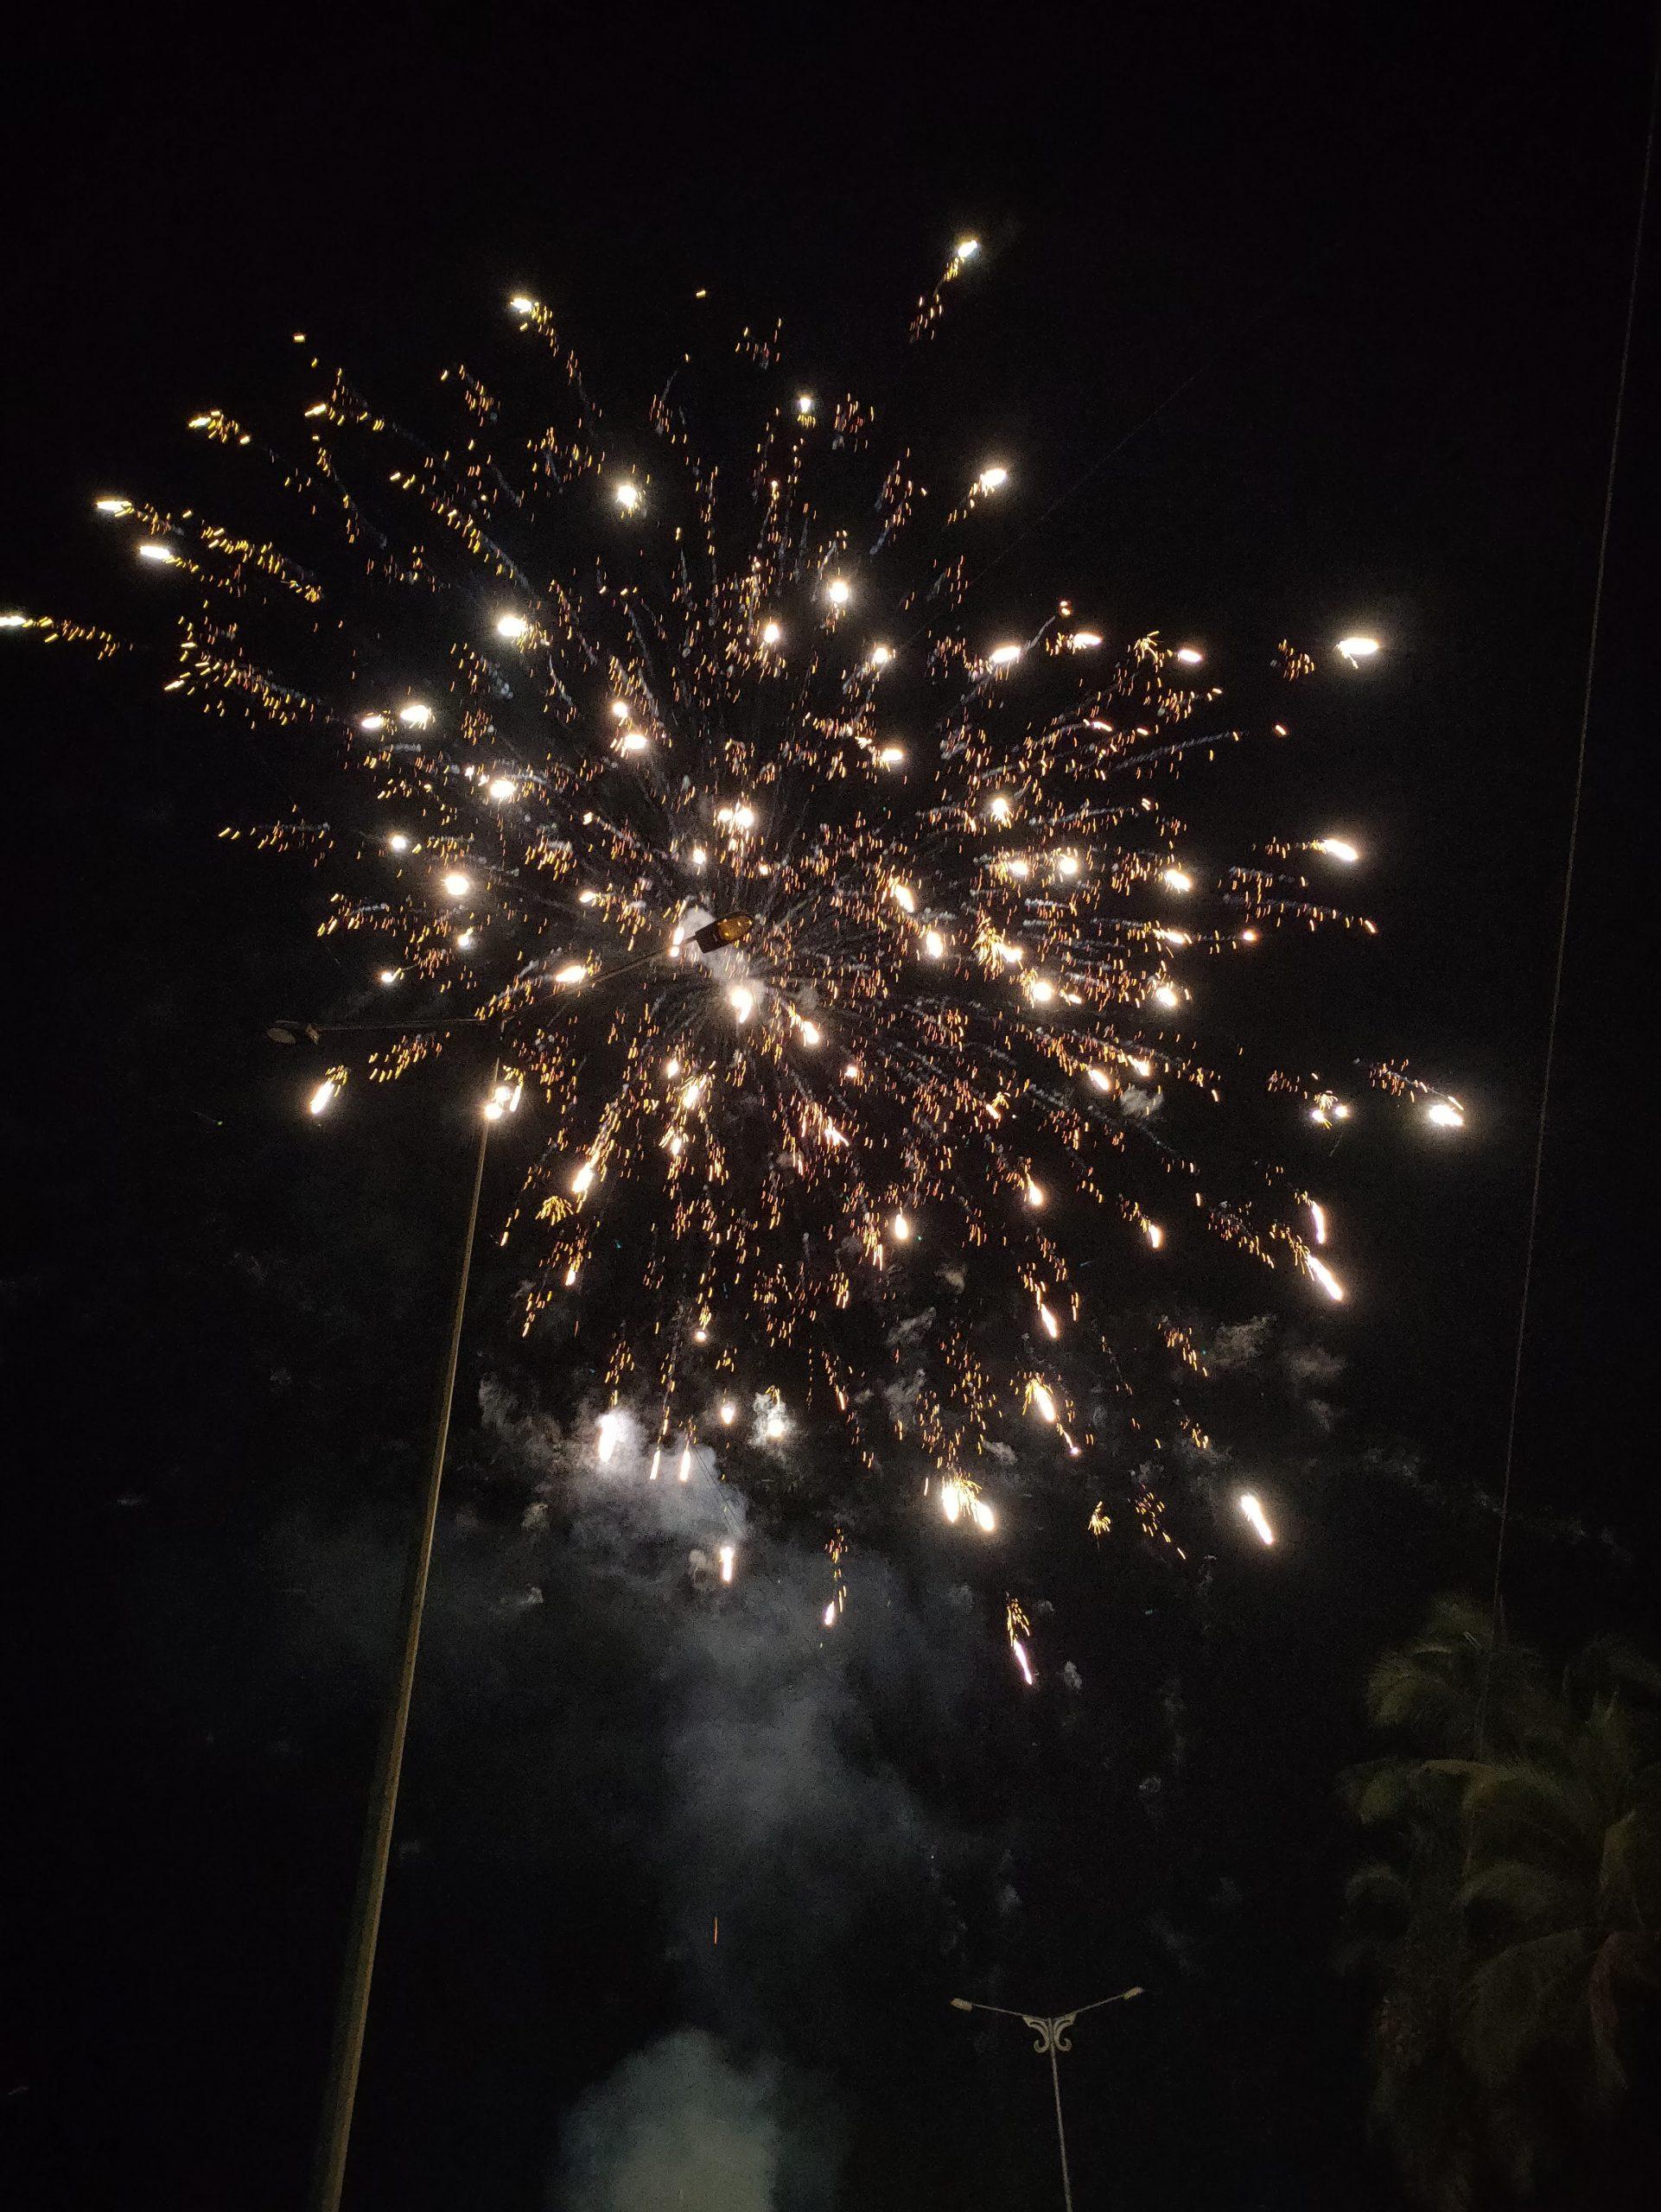 Firecrackers sparking